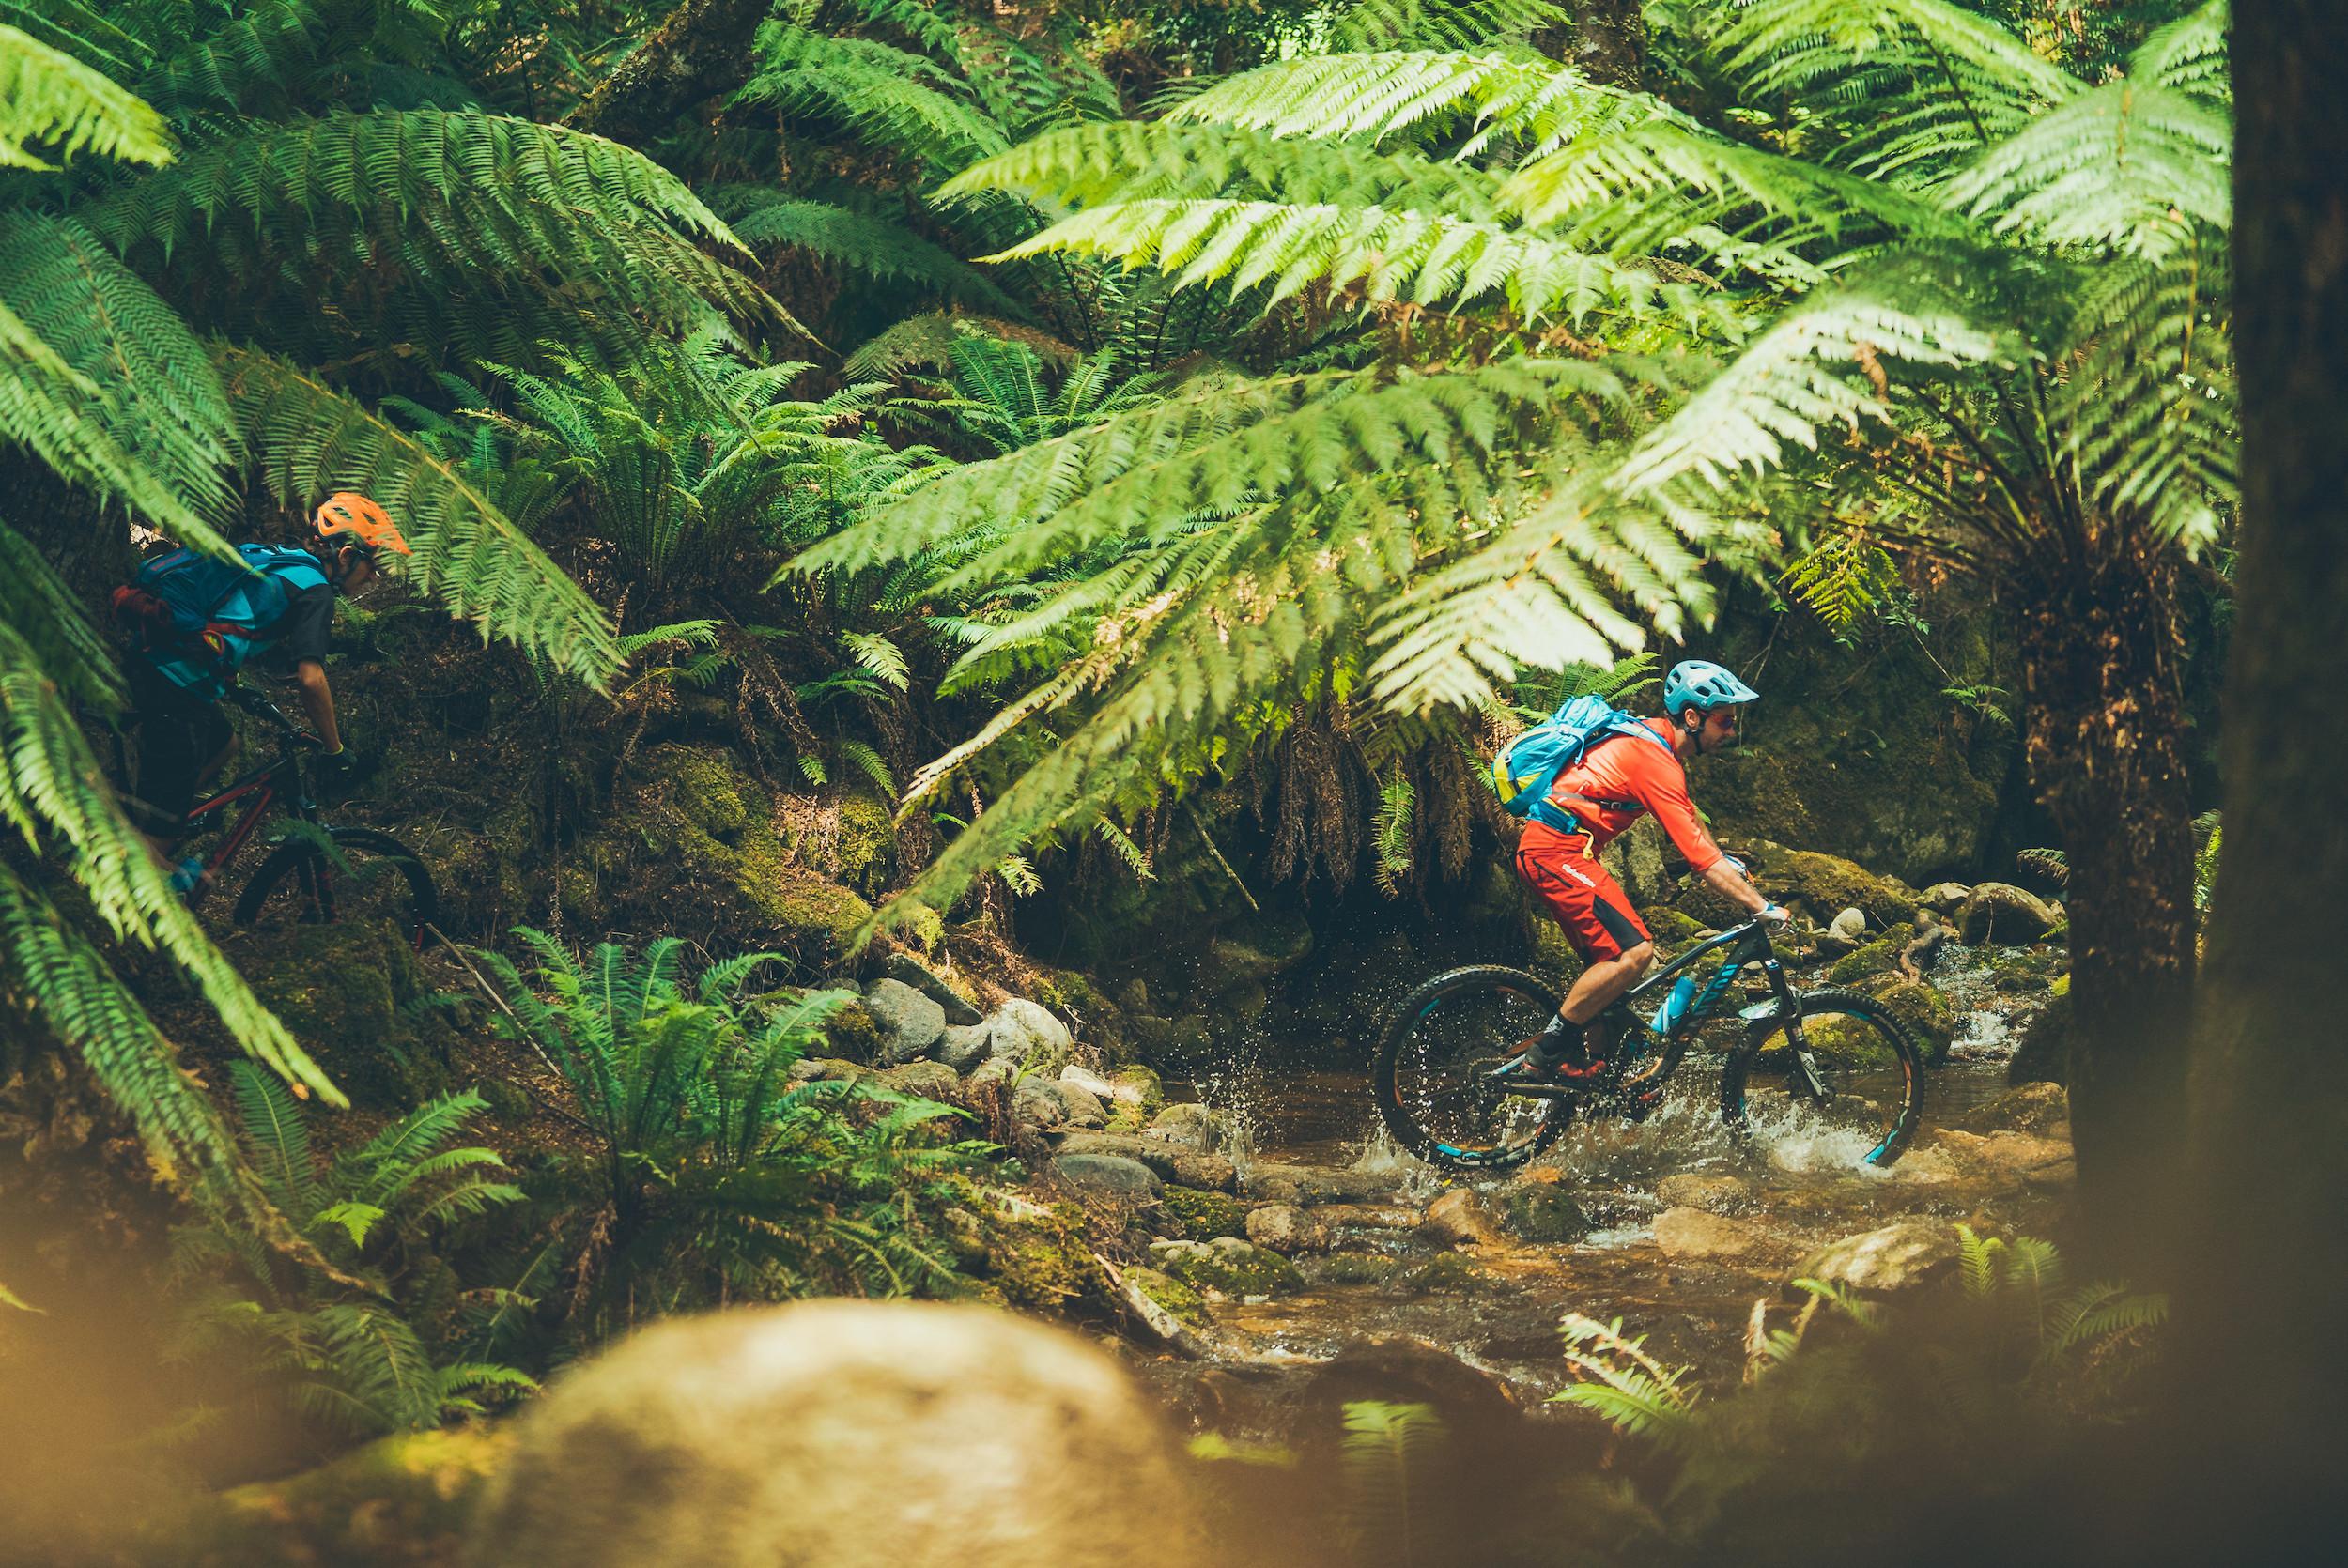 Blue Derby Mountain Bike Trails